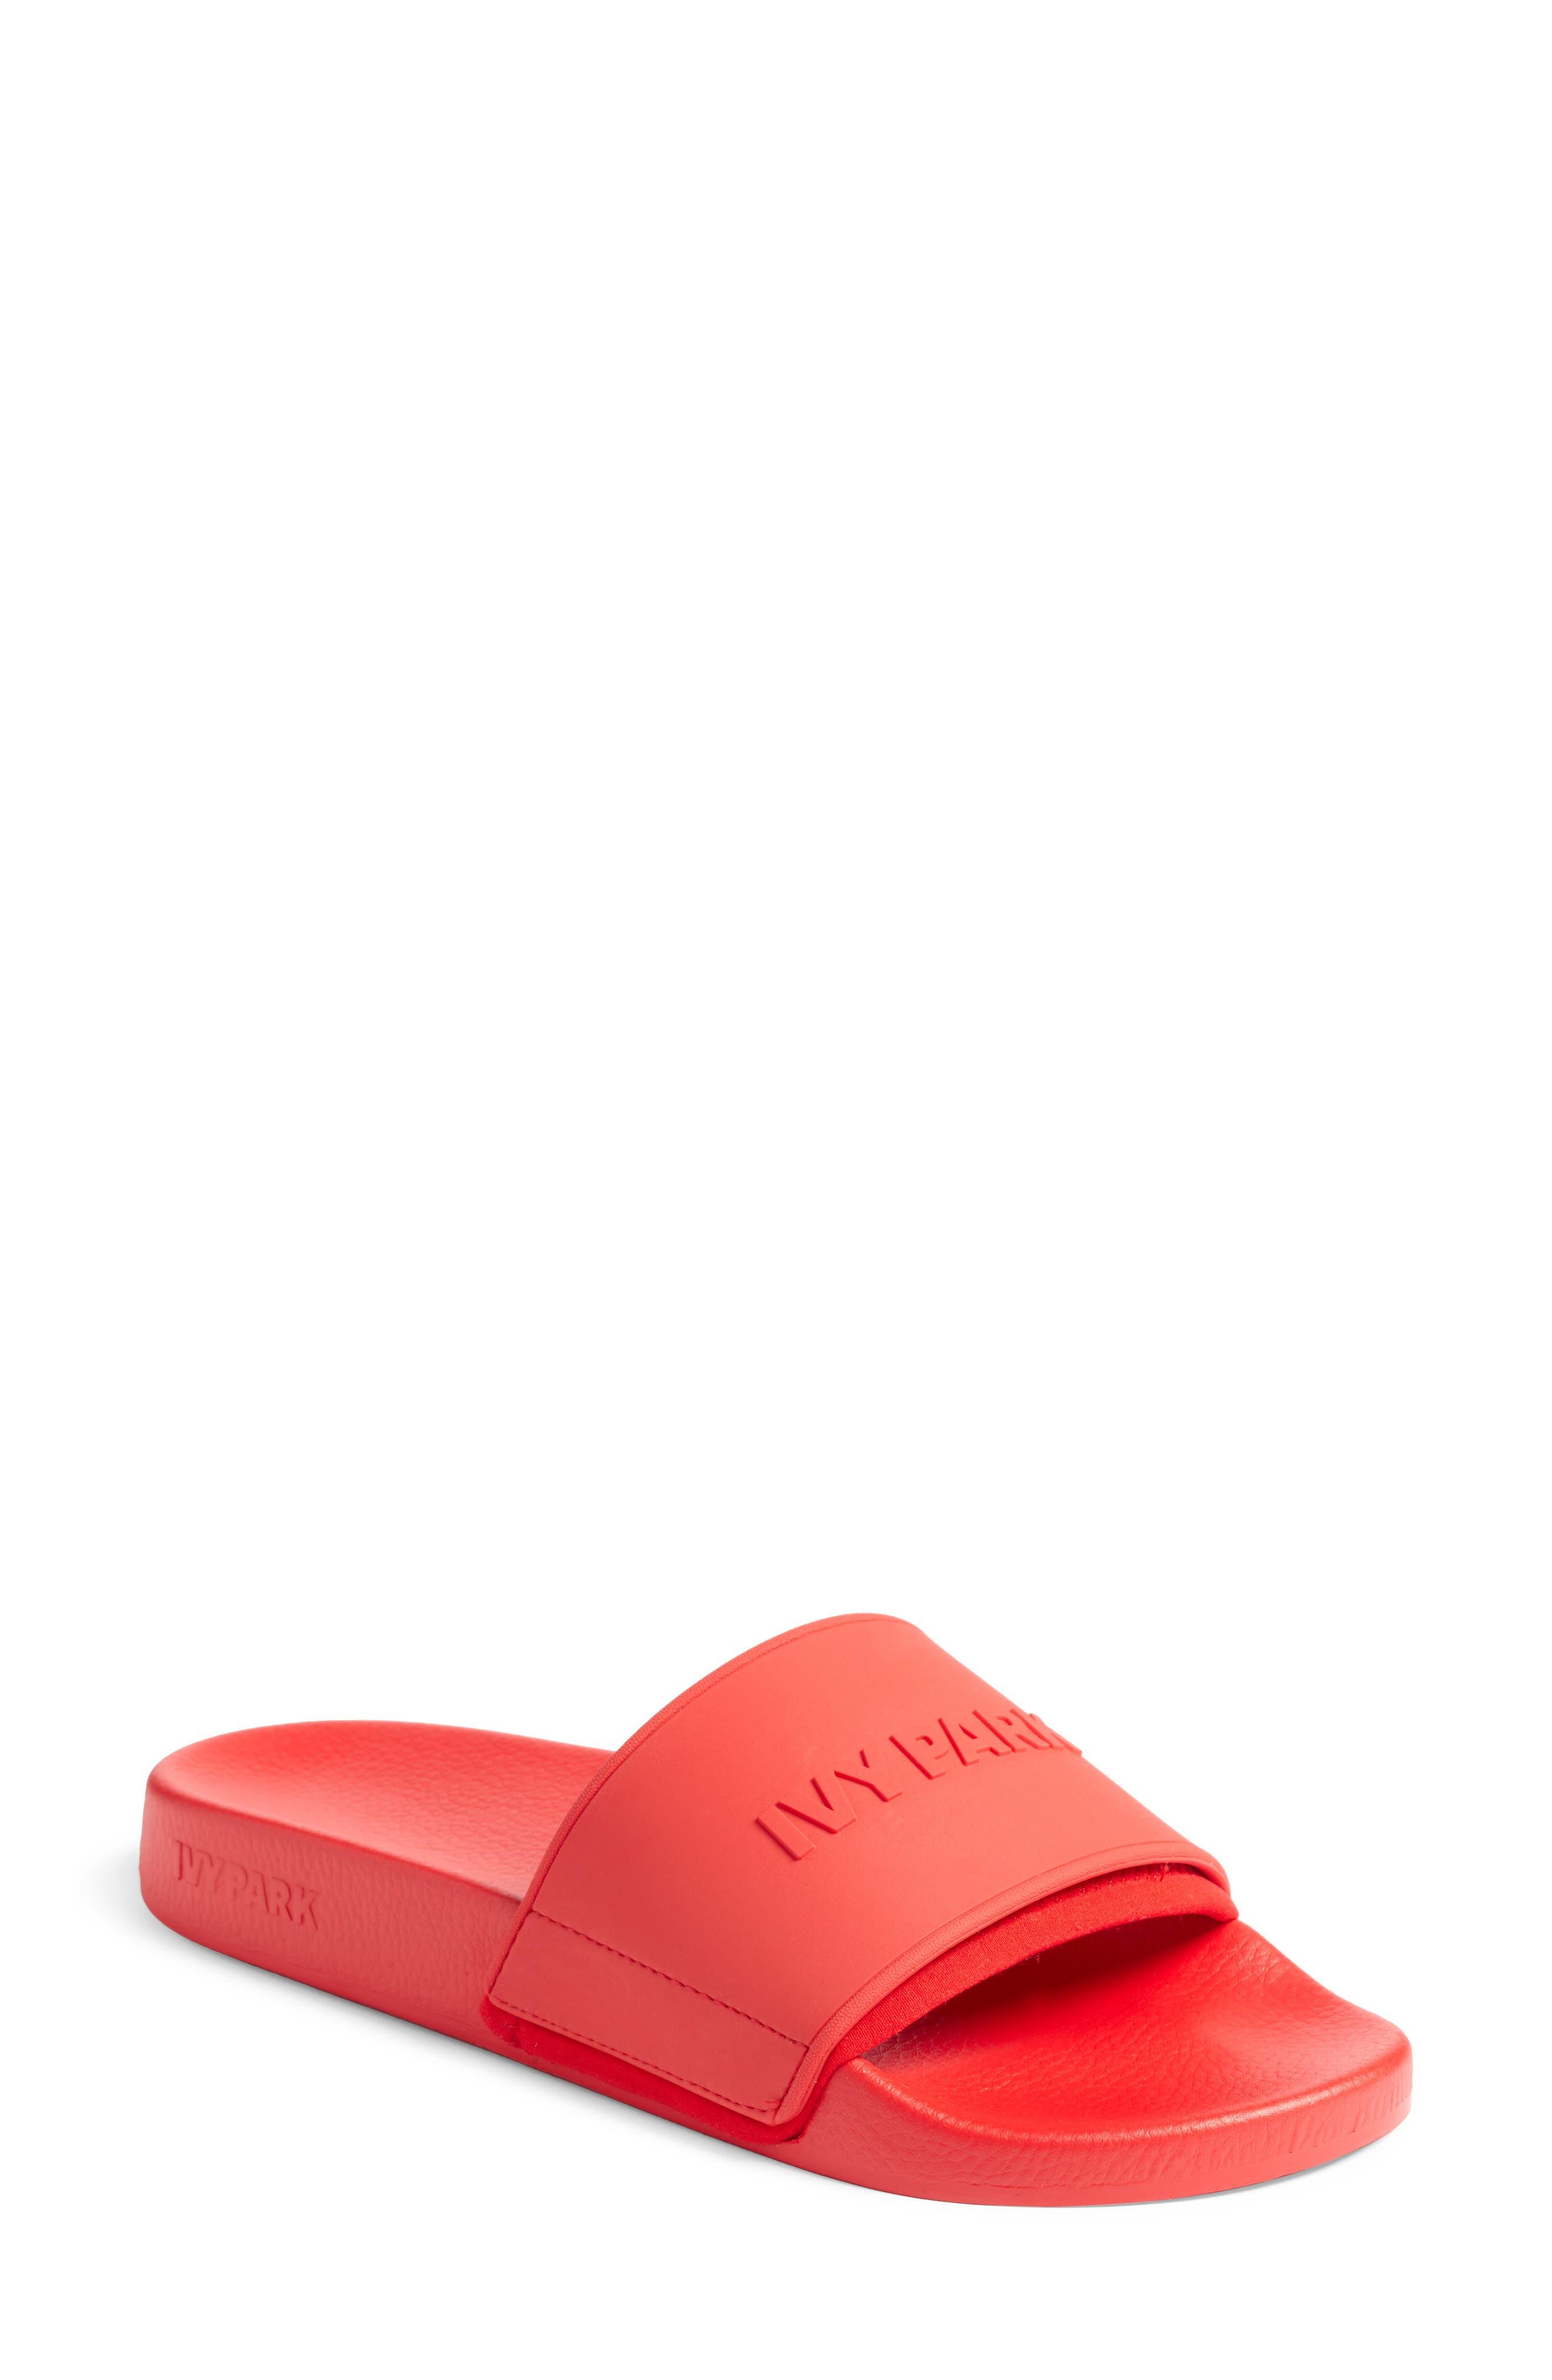 IVY PARK<SUP>®</SUP>, Embossed Logo Slide Sandal, Main thumbnail 1, color, 600